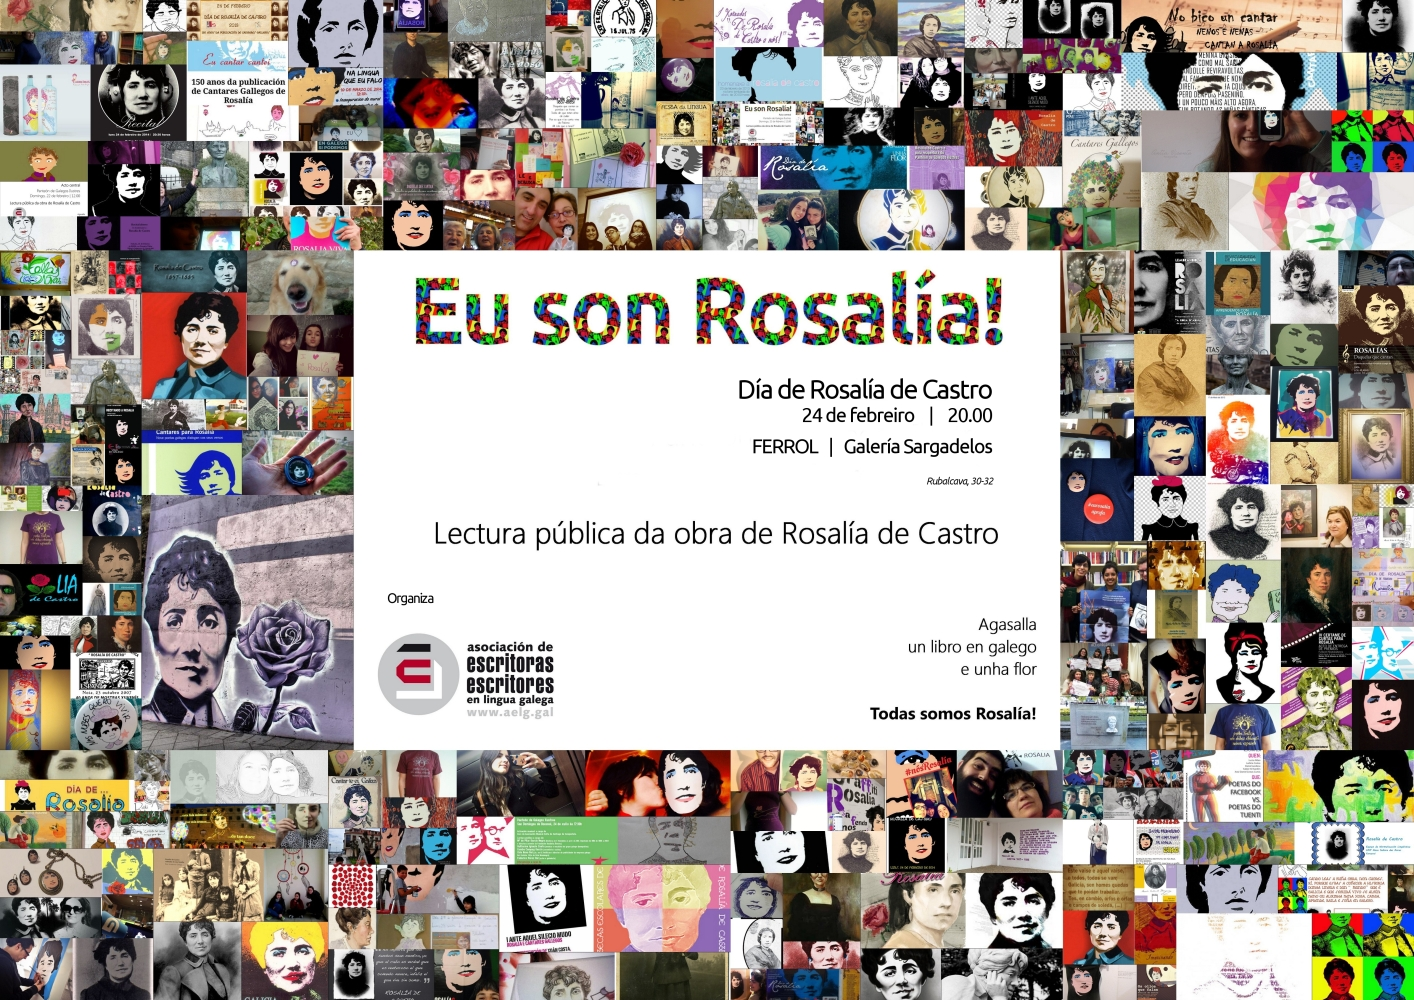 2015-02-24 Ferrol Eu Son Rosalía